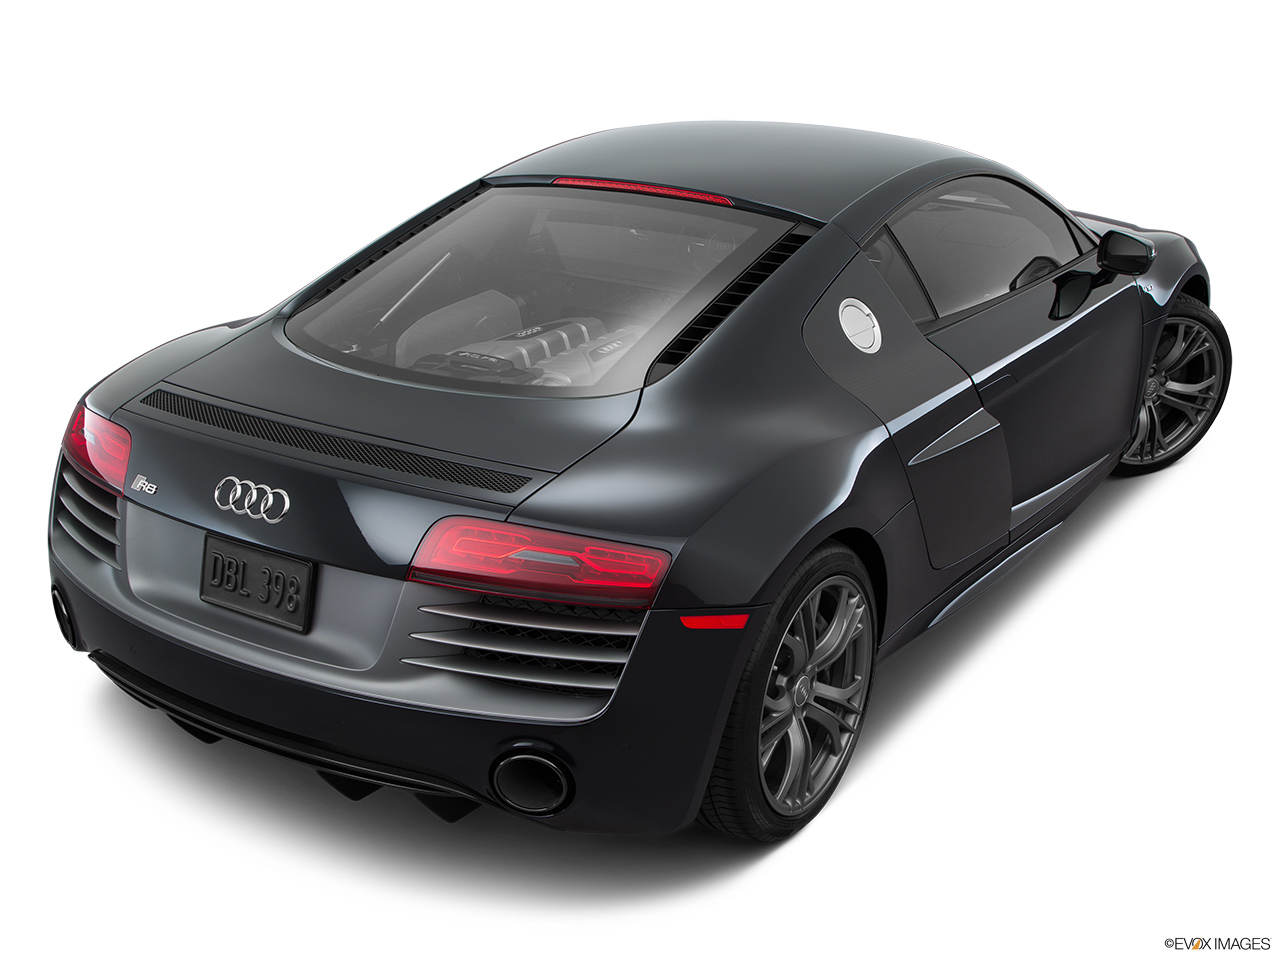 2015 Audi R8 Conv Automatic Quattro Spyder V10 Front Angle View